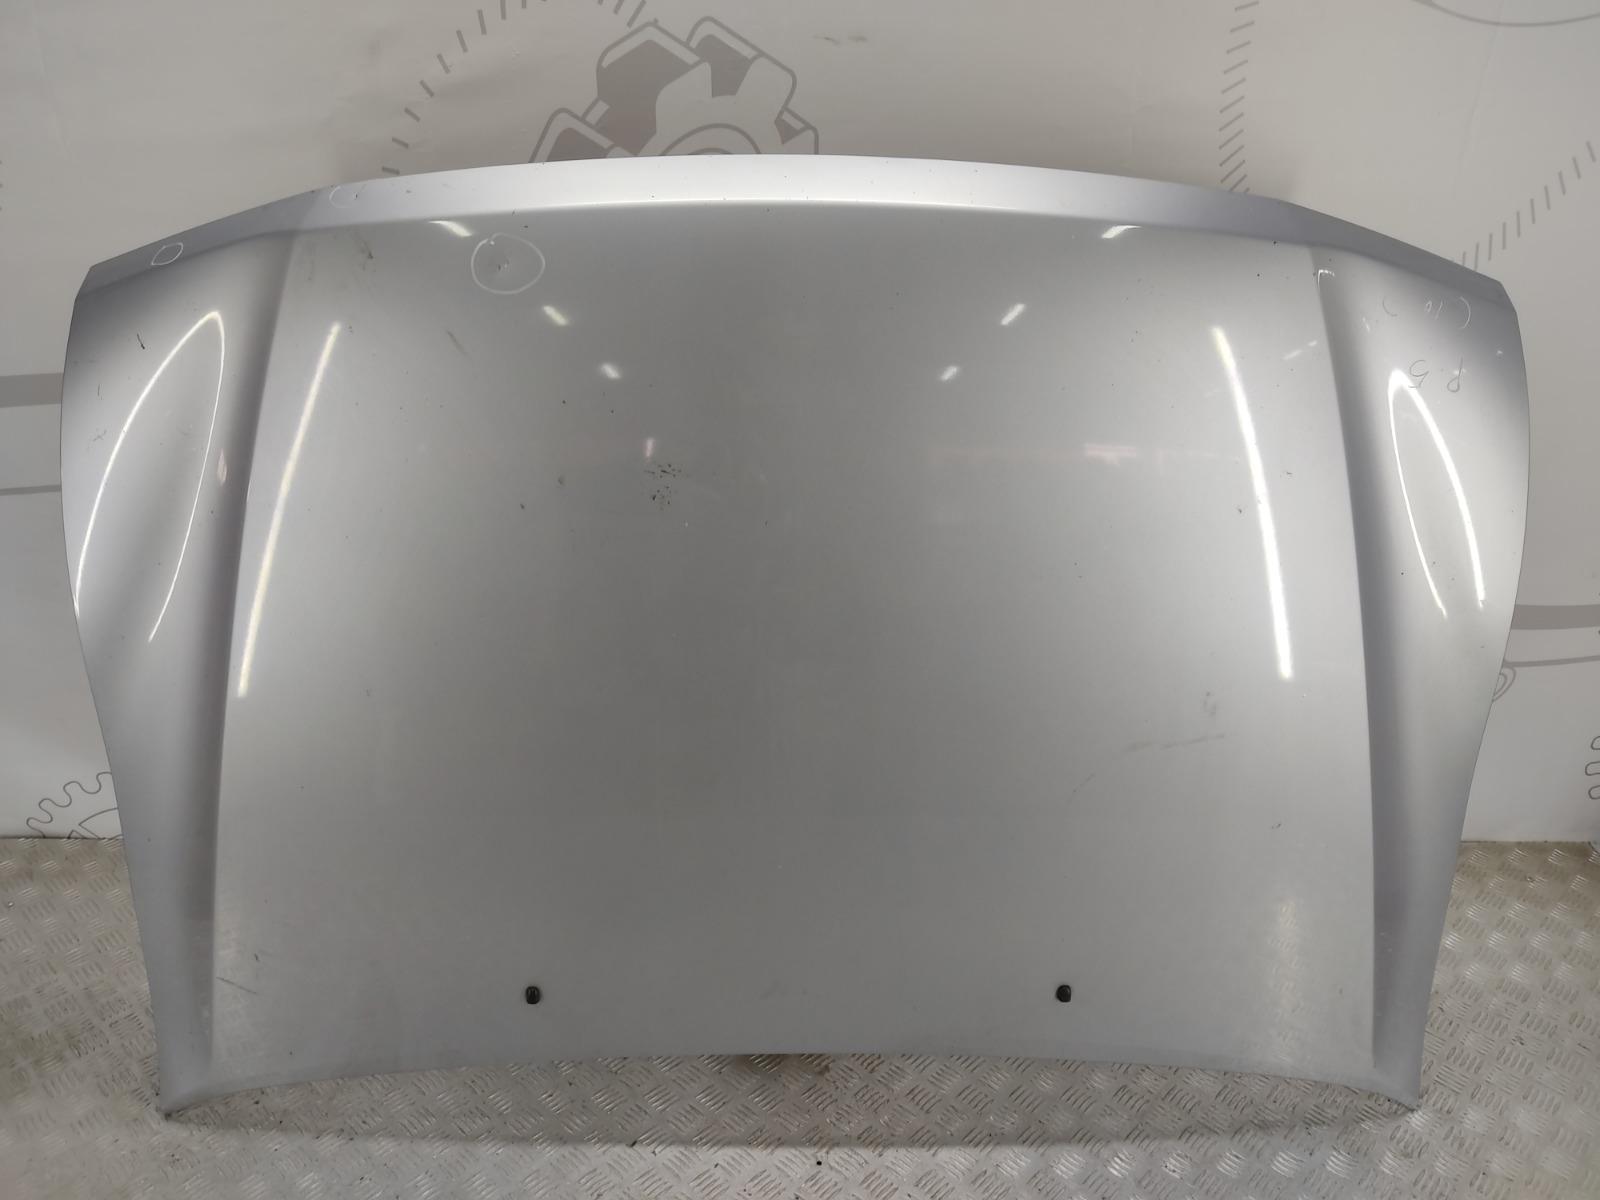 Капот Mitsubishi Pajero 3.2 DID 2003 (б/у)